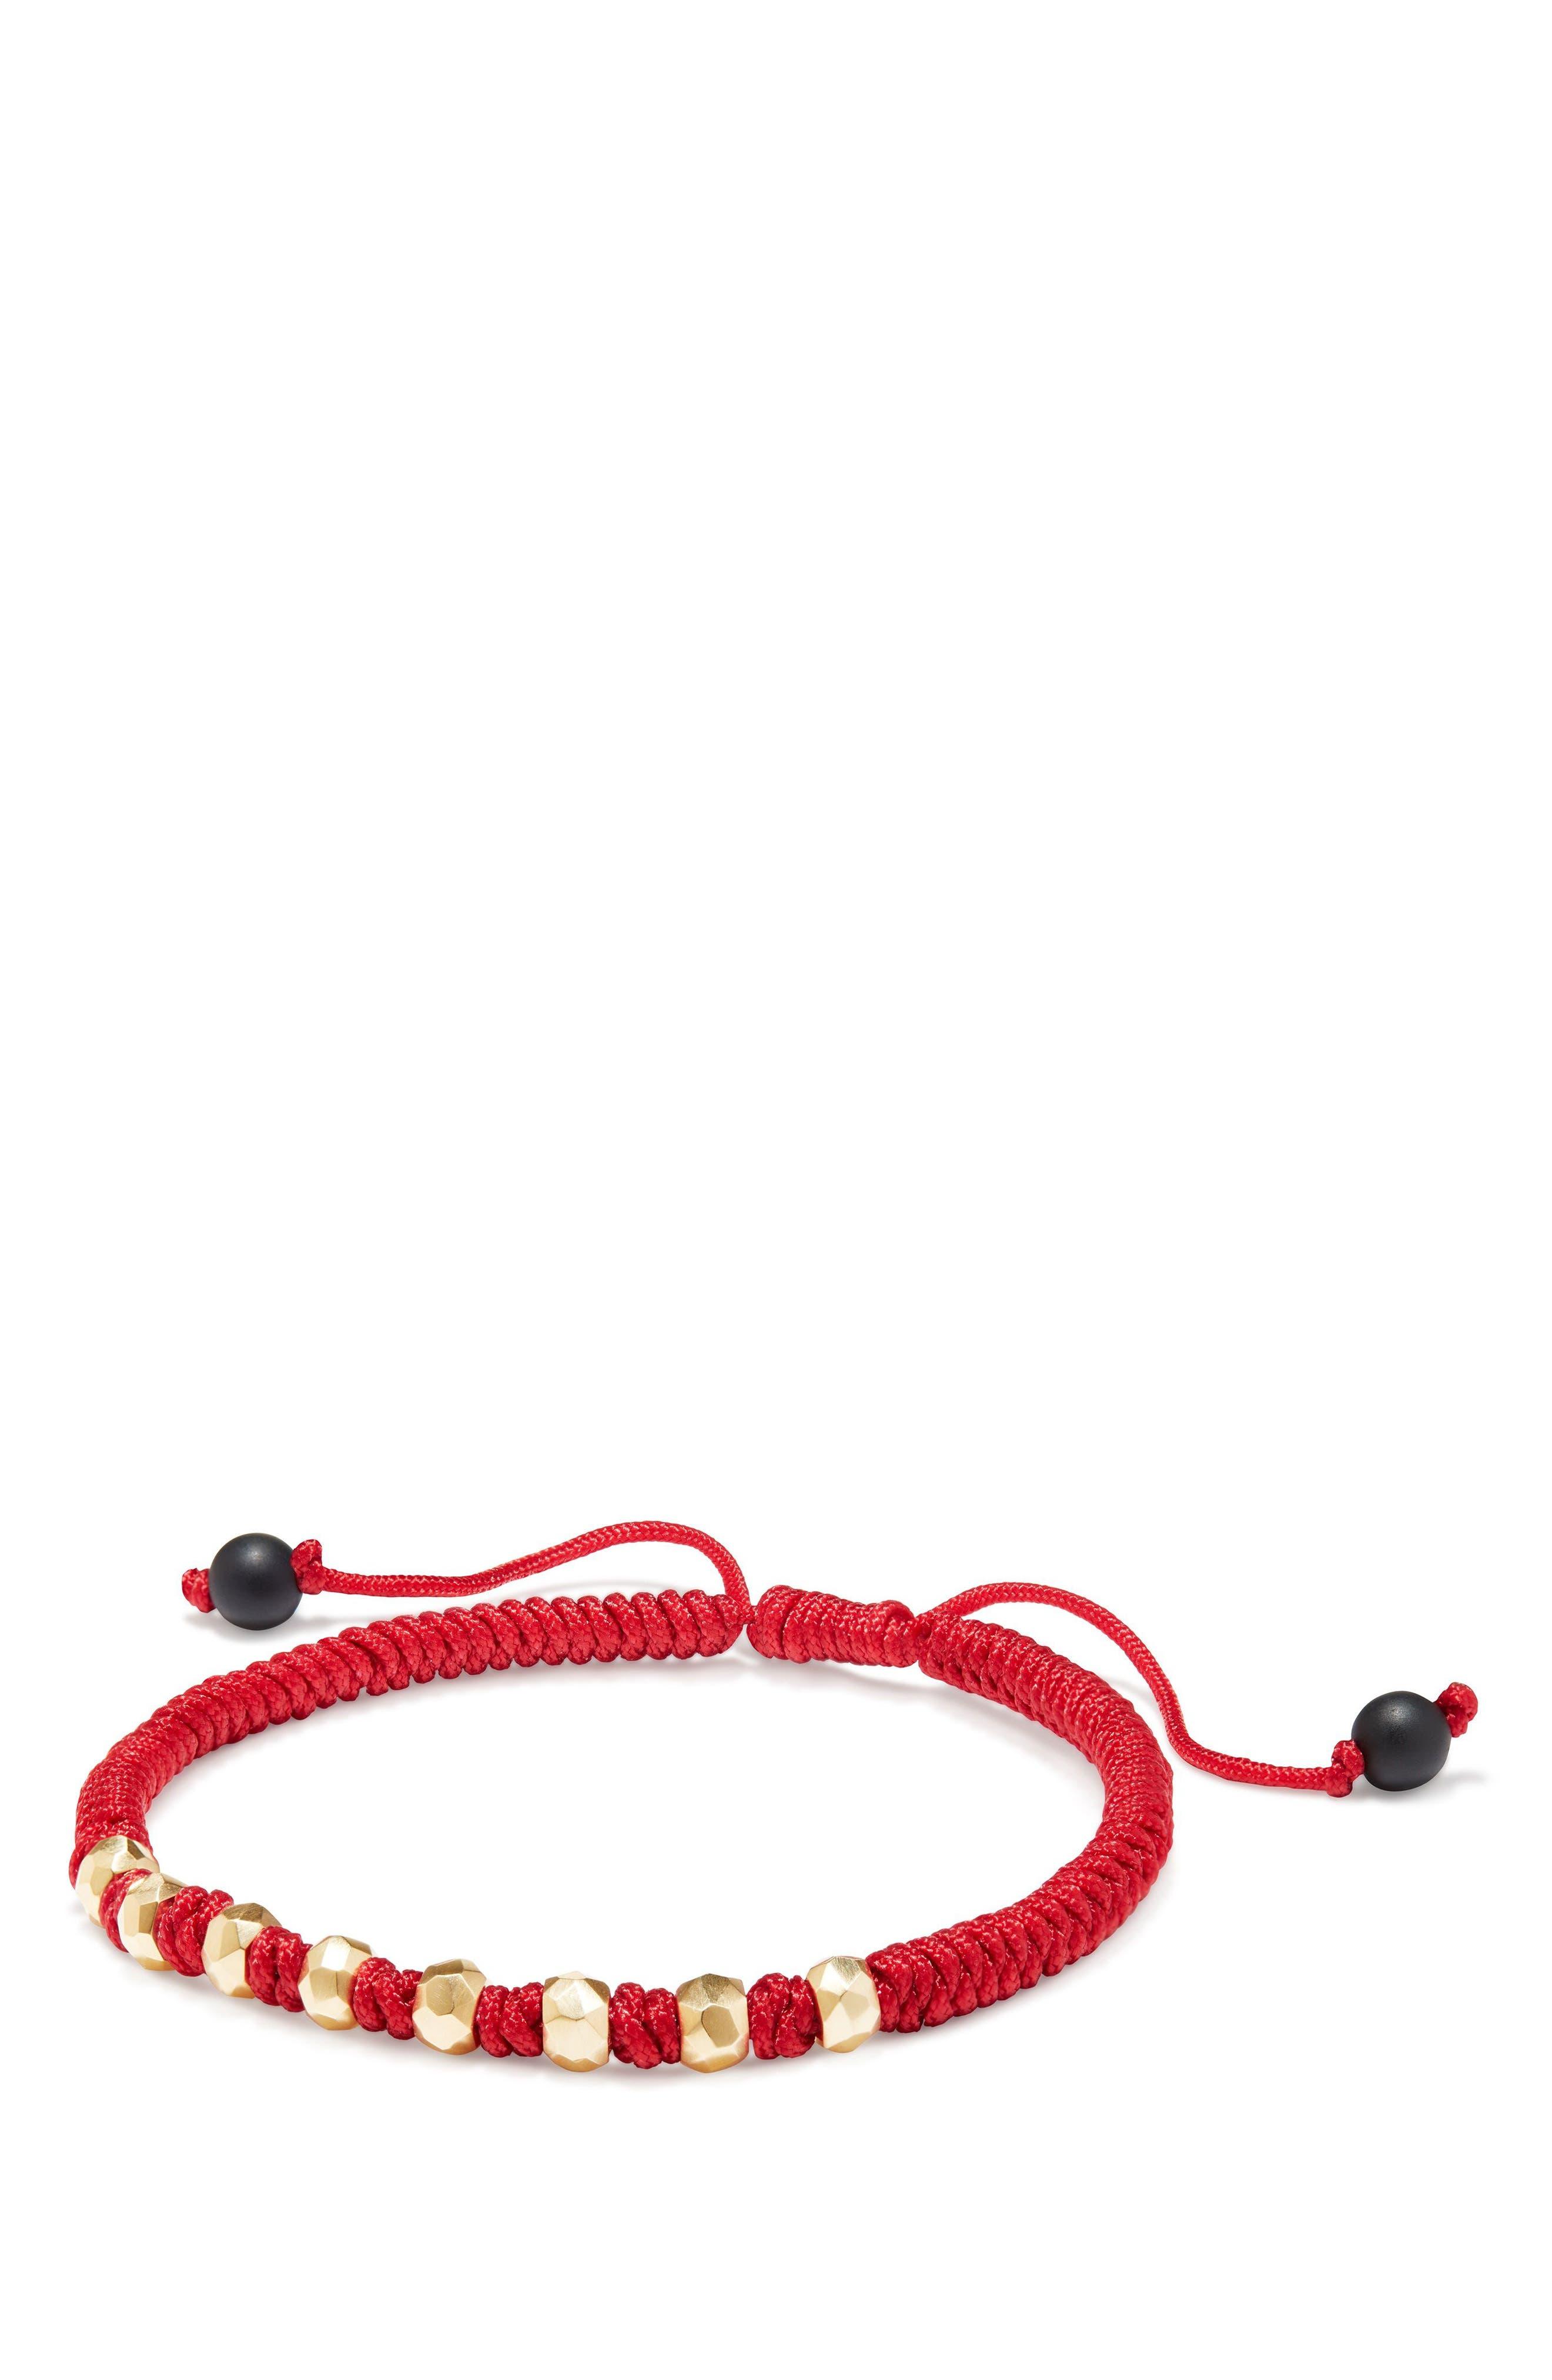 David Yurman DY Fortune Woven Bracelet with Black Onyx in 18K Gold